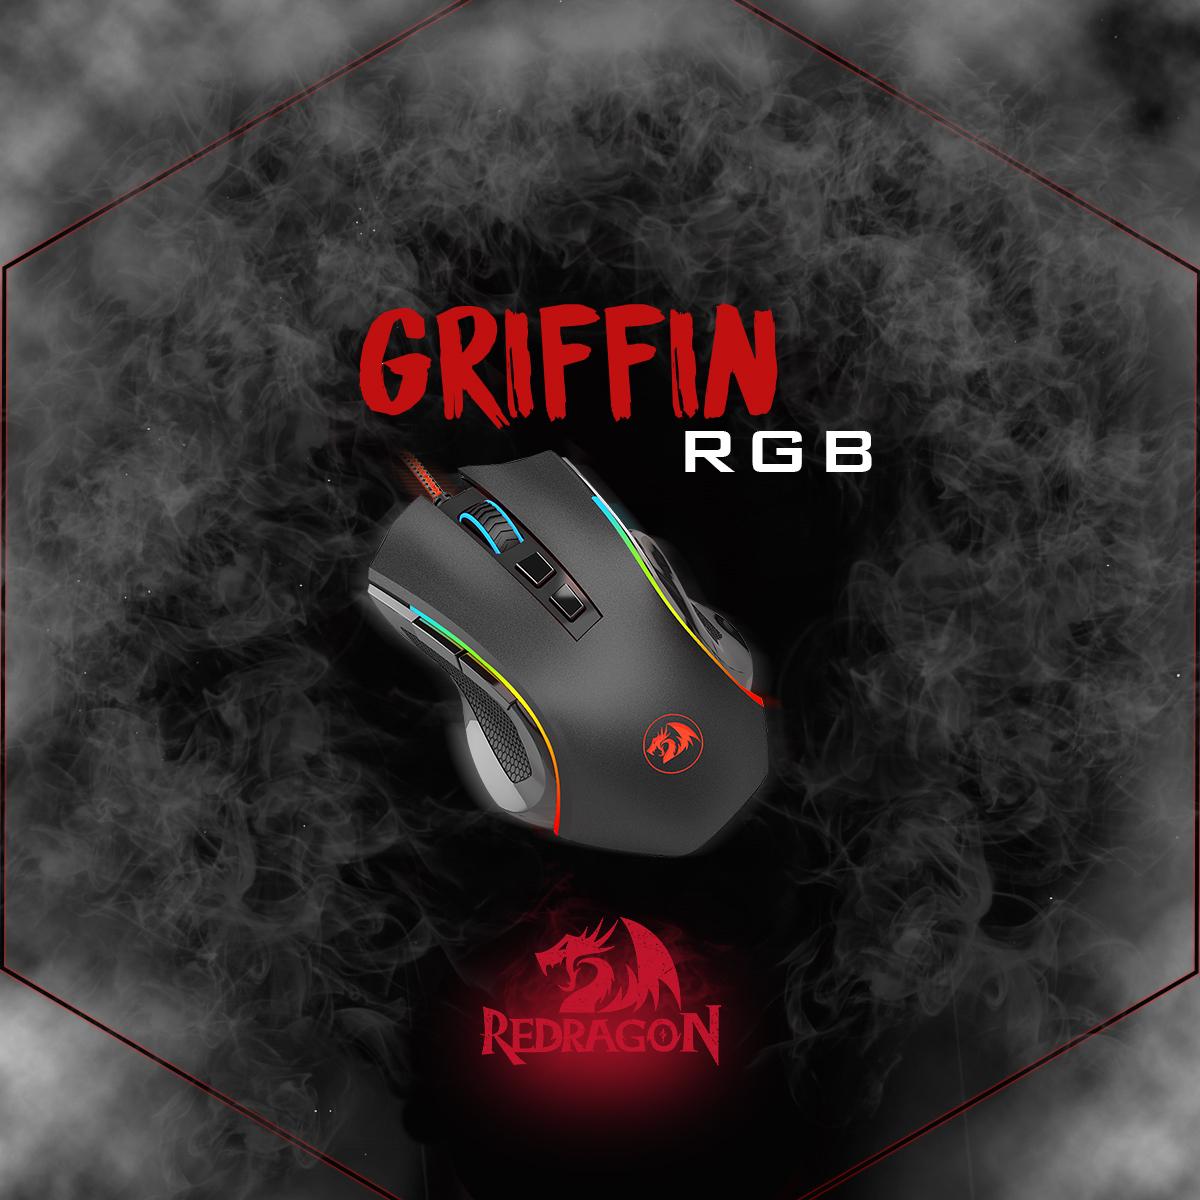 GRIFFIN M607